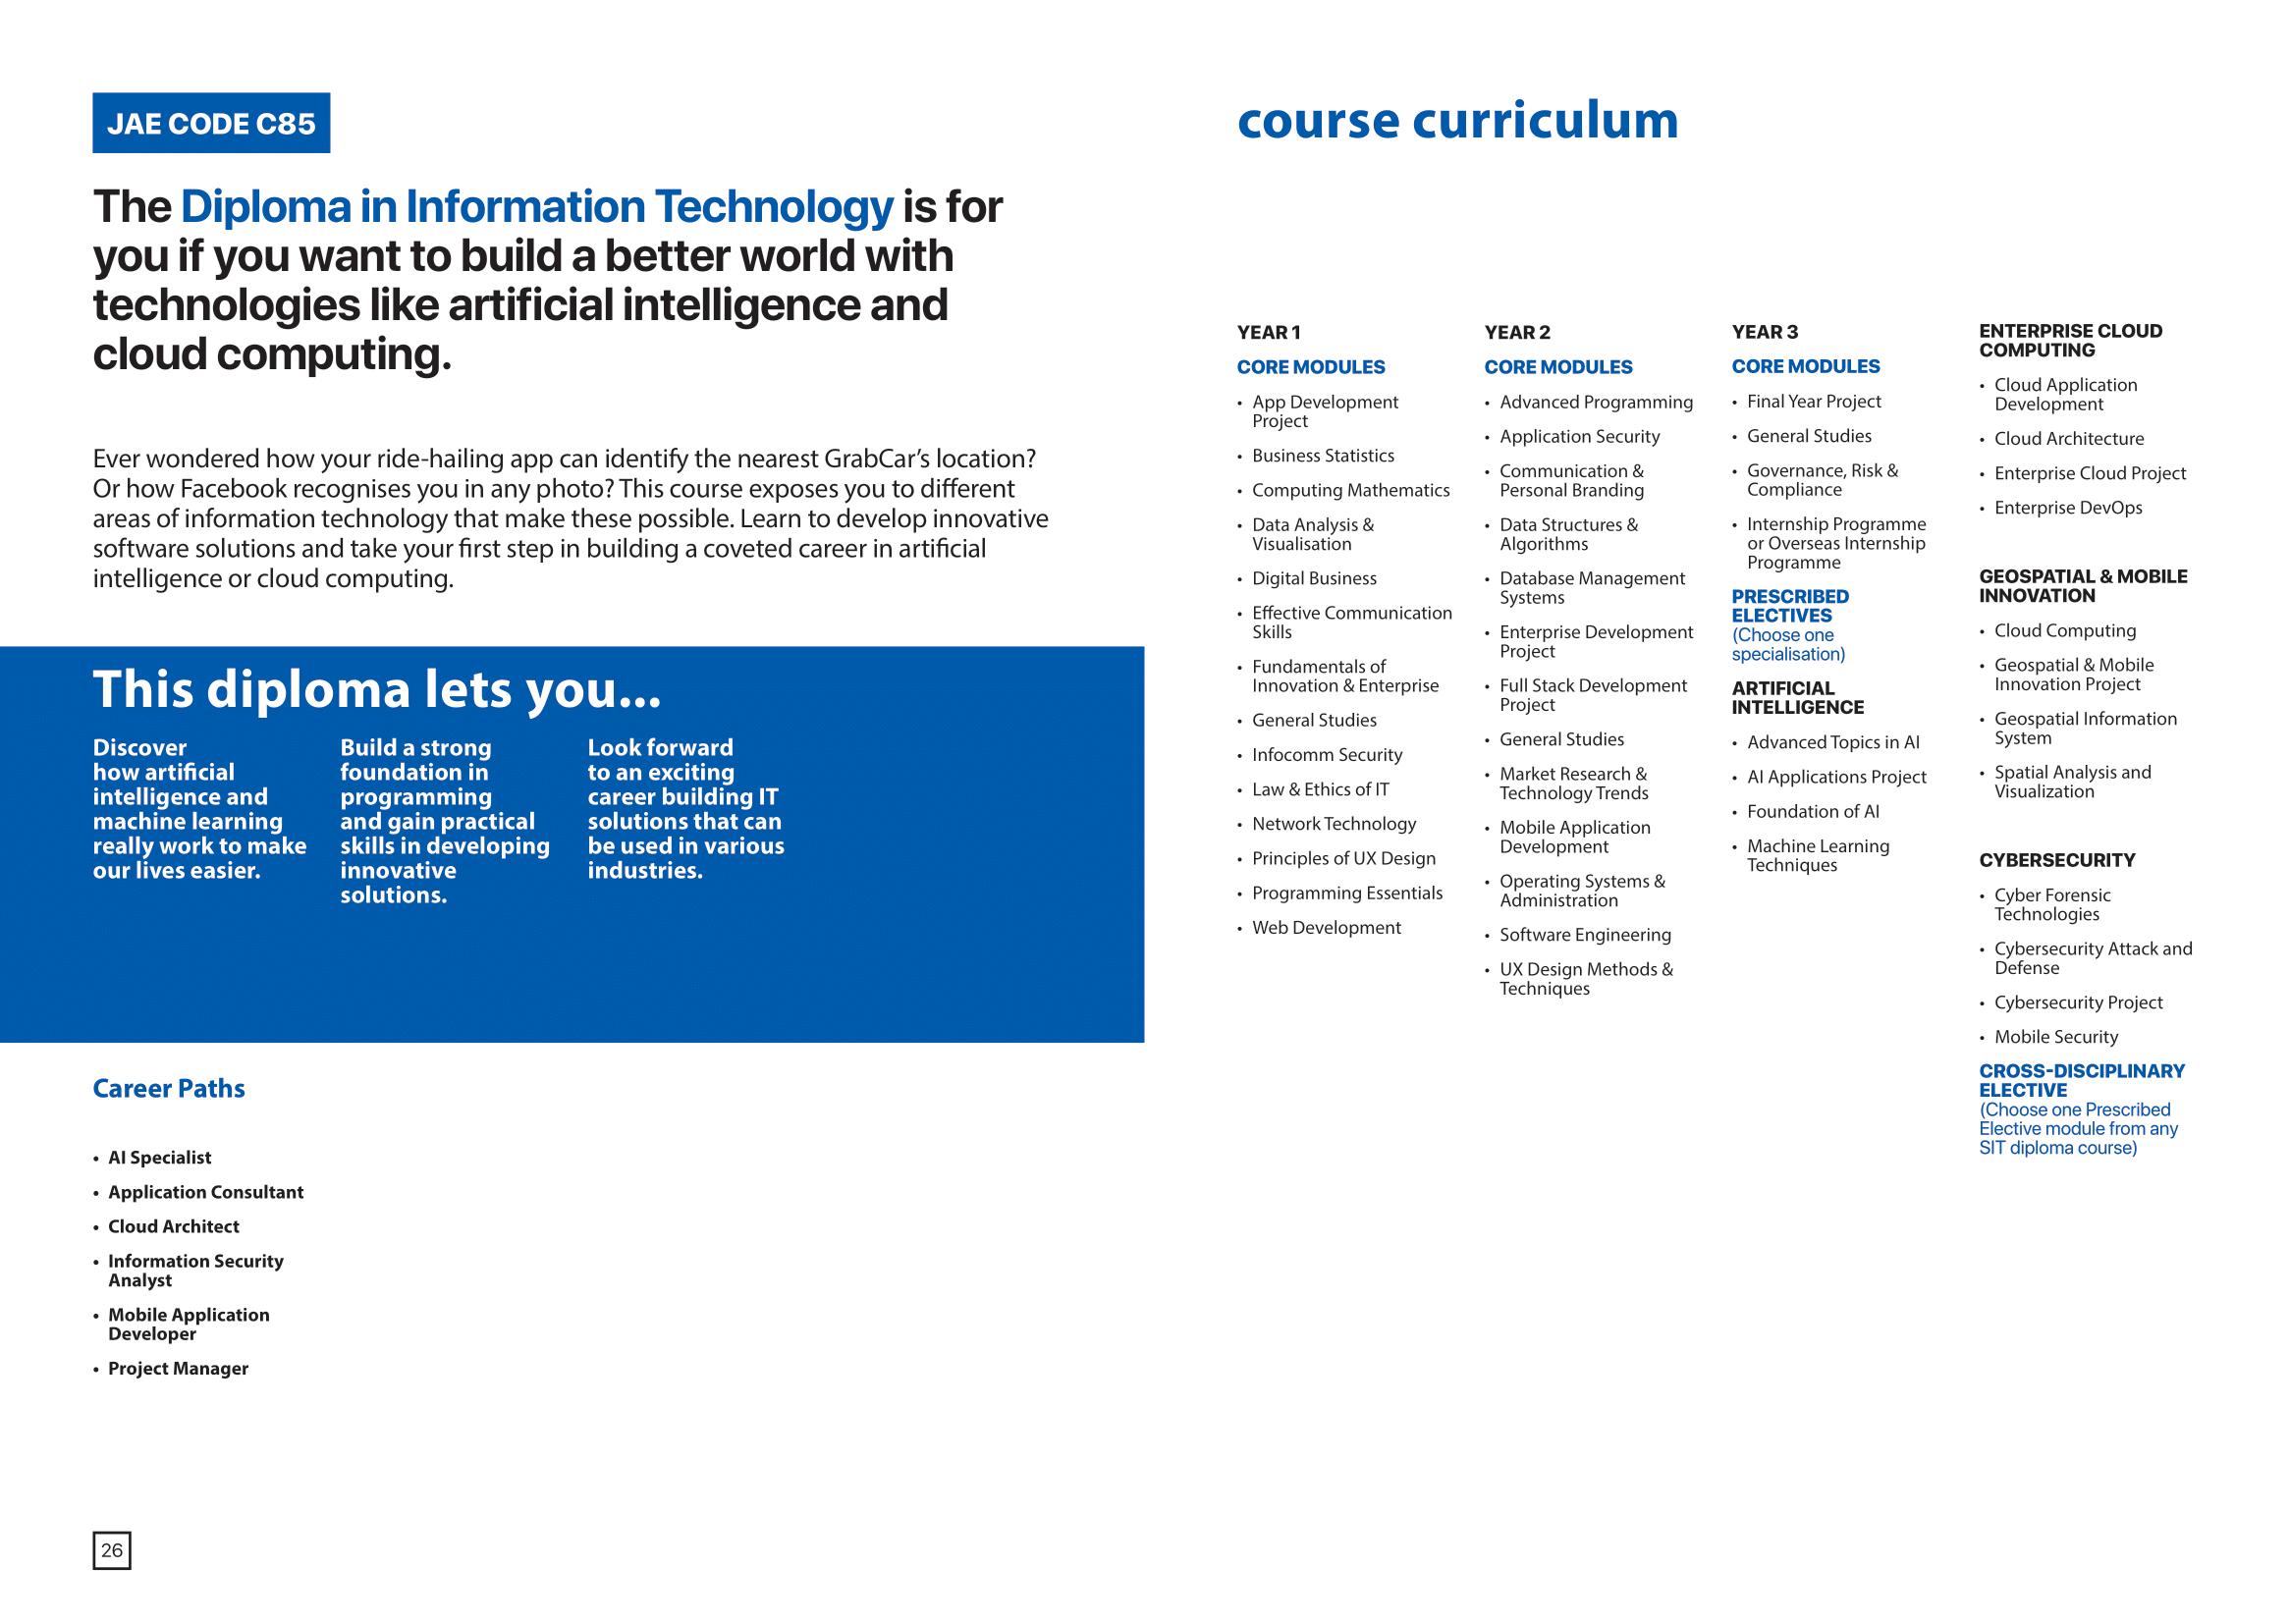 School of Information Technology 2020-15